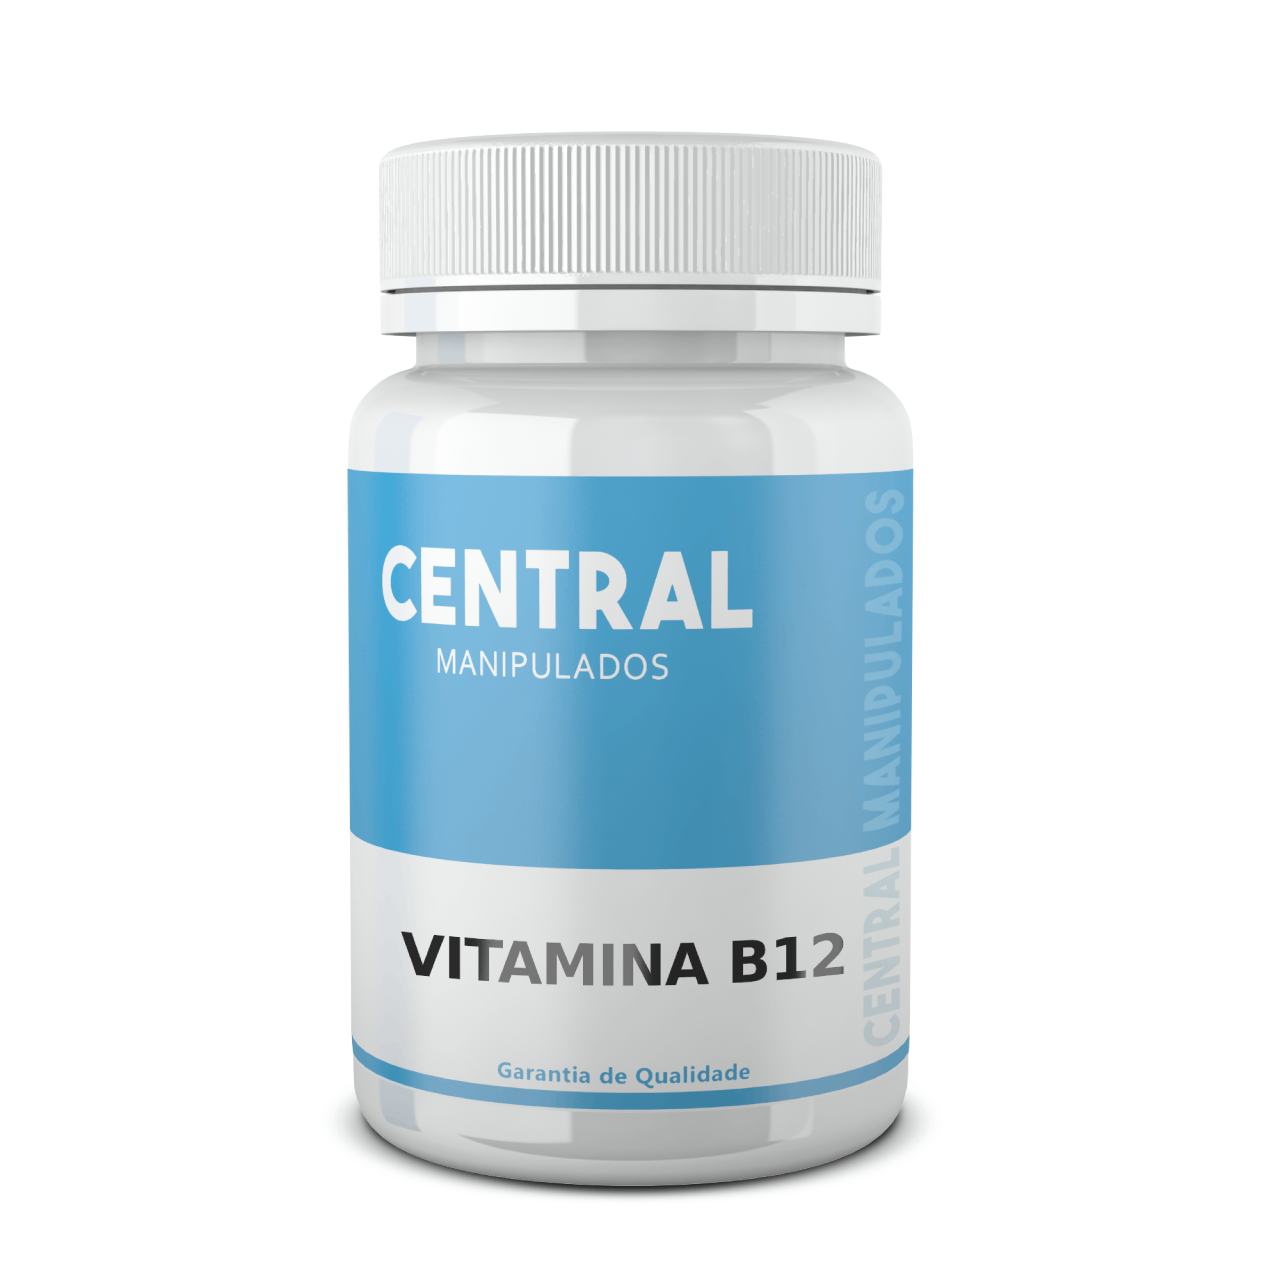 Vitamina B12 1mg - 120 Comprimidos Sublingual  (Tapiocaps)